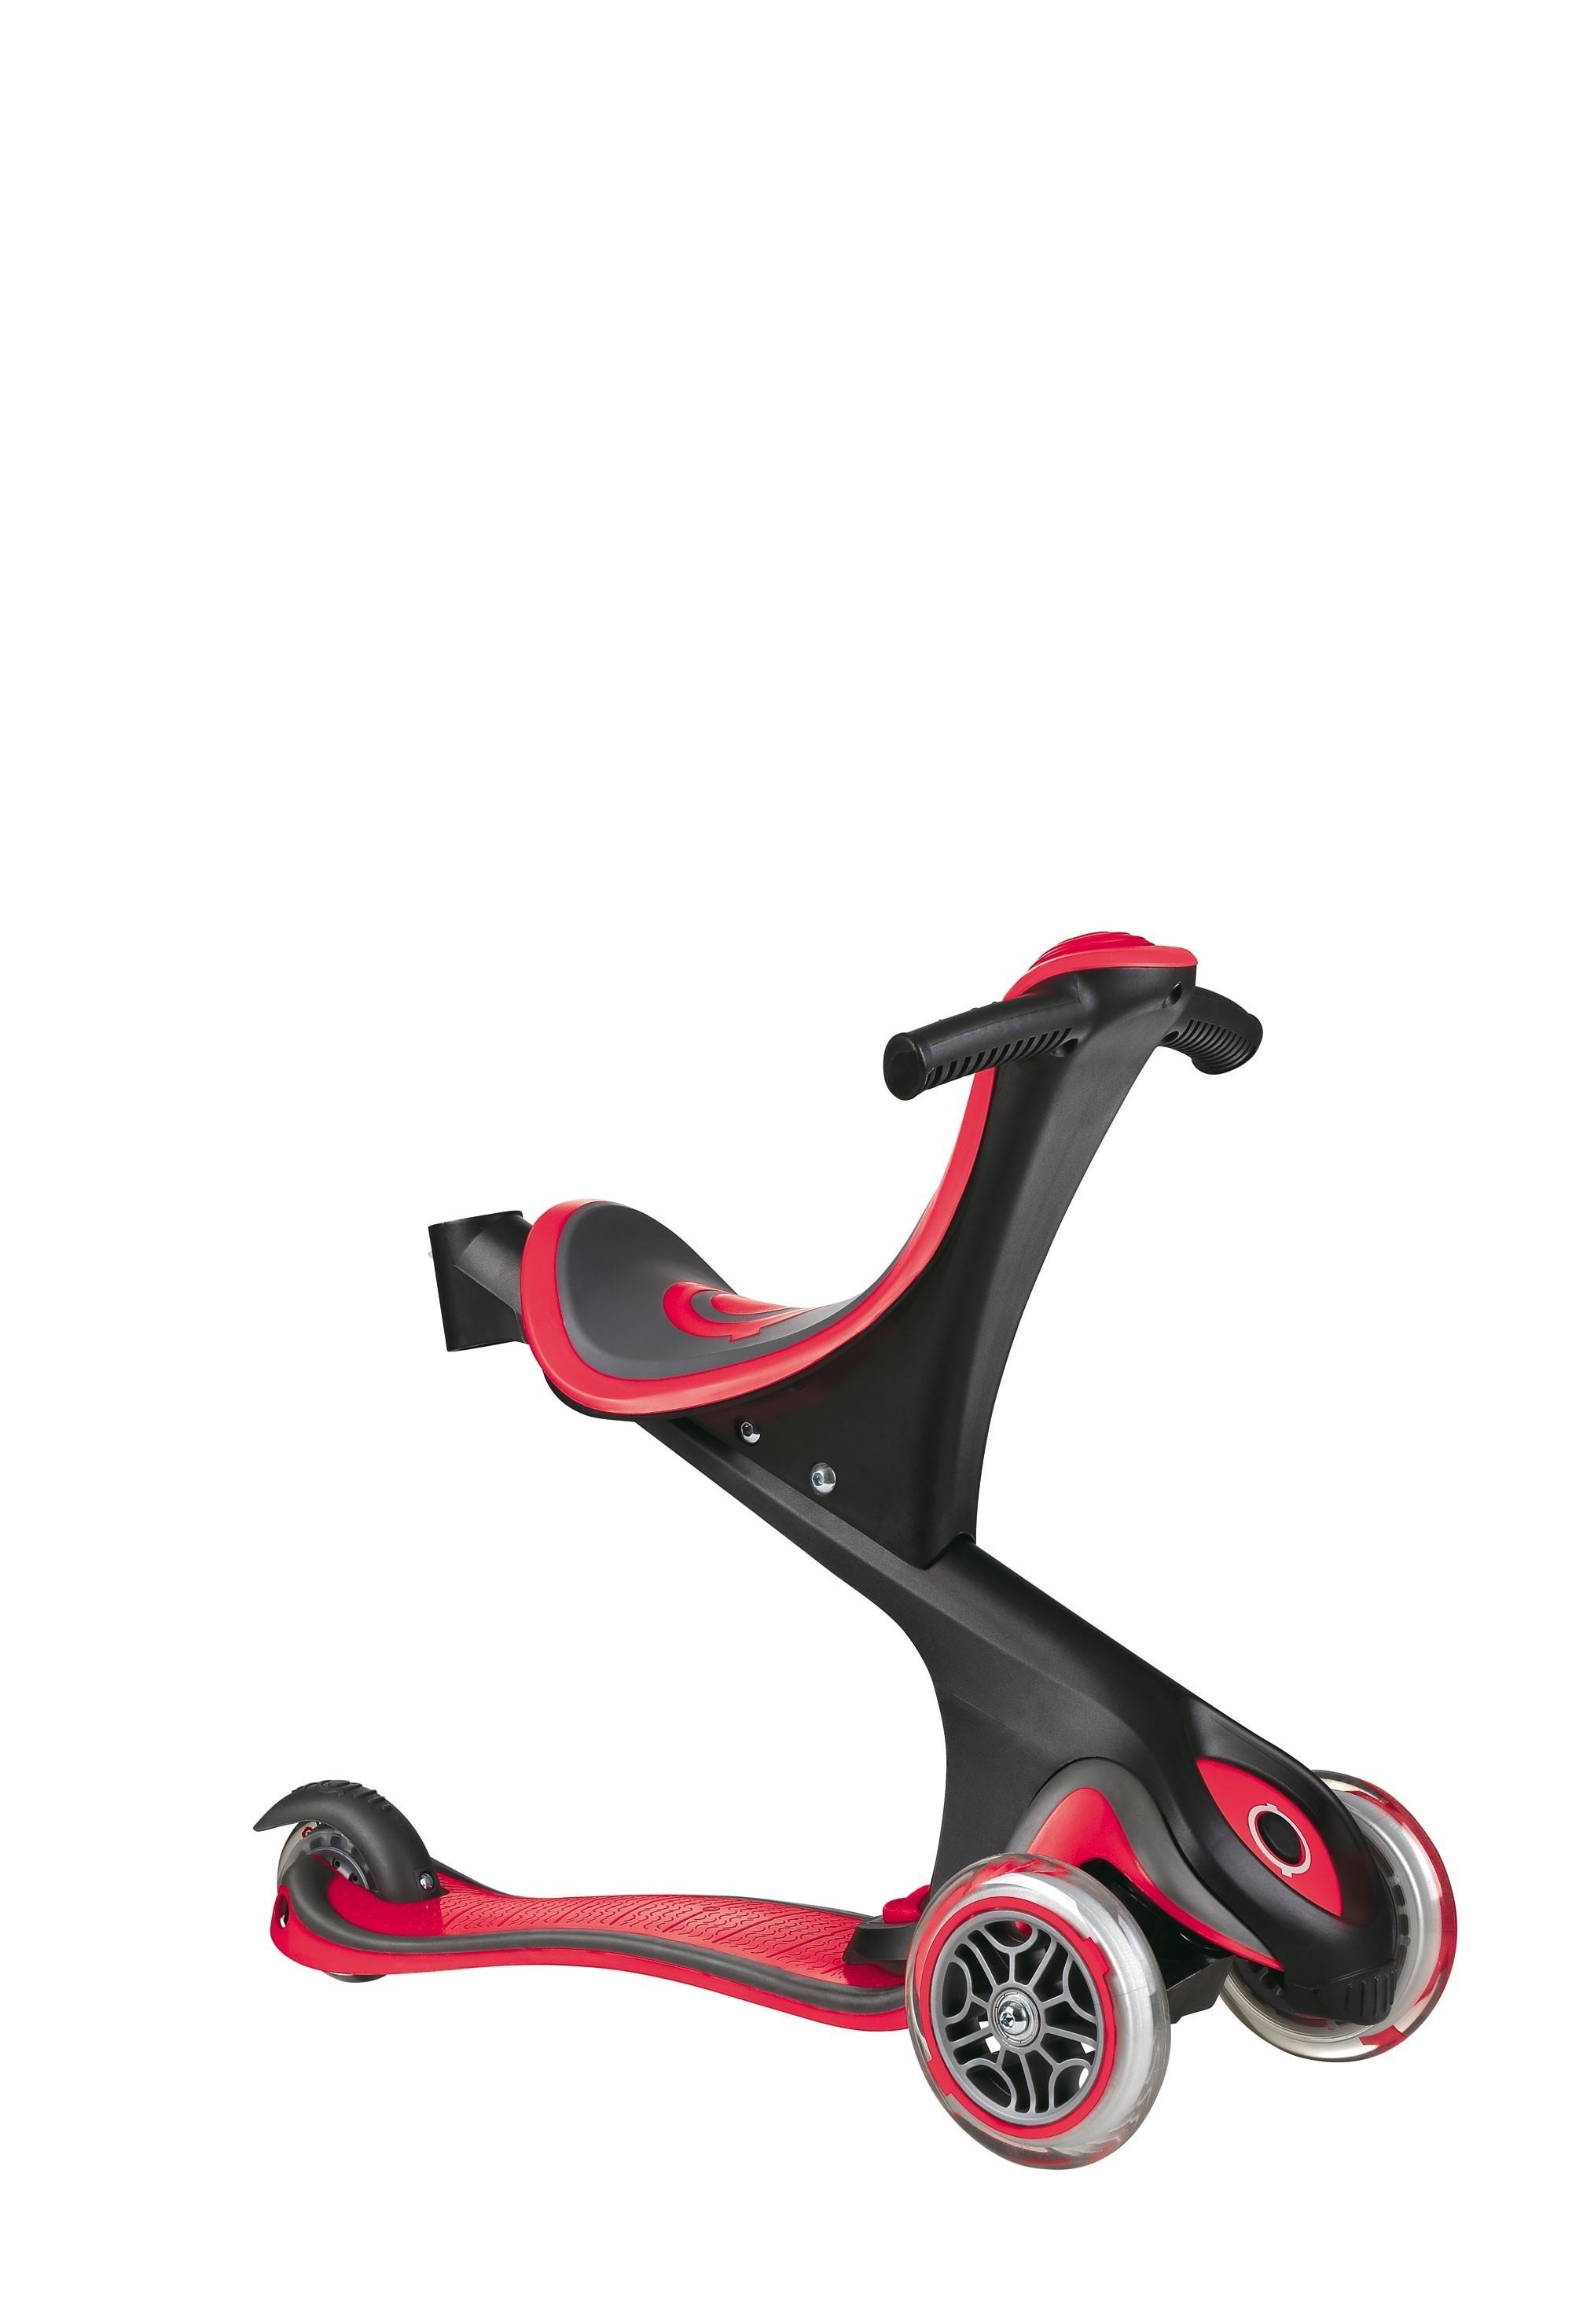 Scooter Kinderroller Dreirad Laufrad Globber Evo Comfort 5in1 rot Bild 2